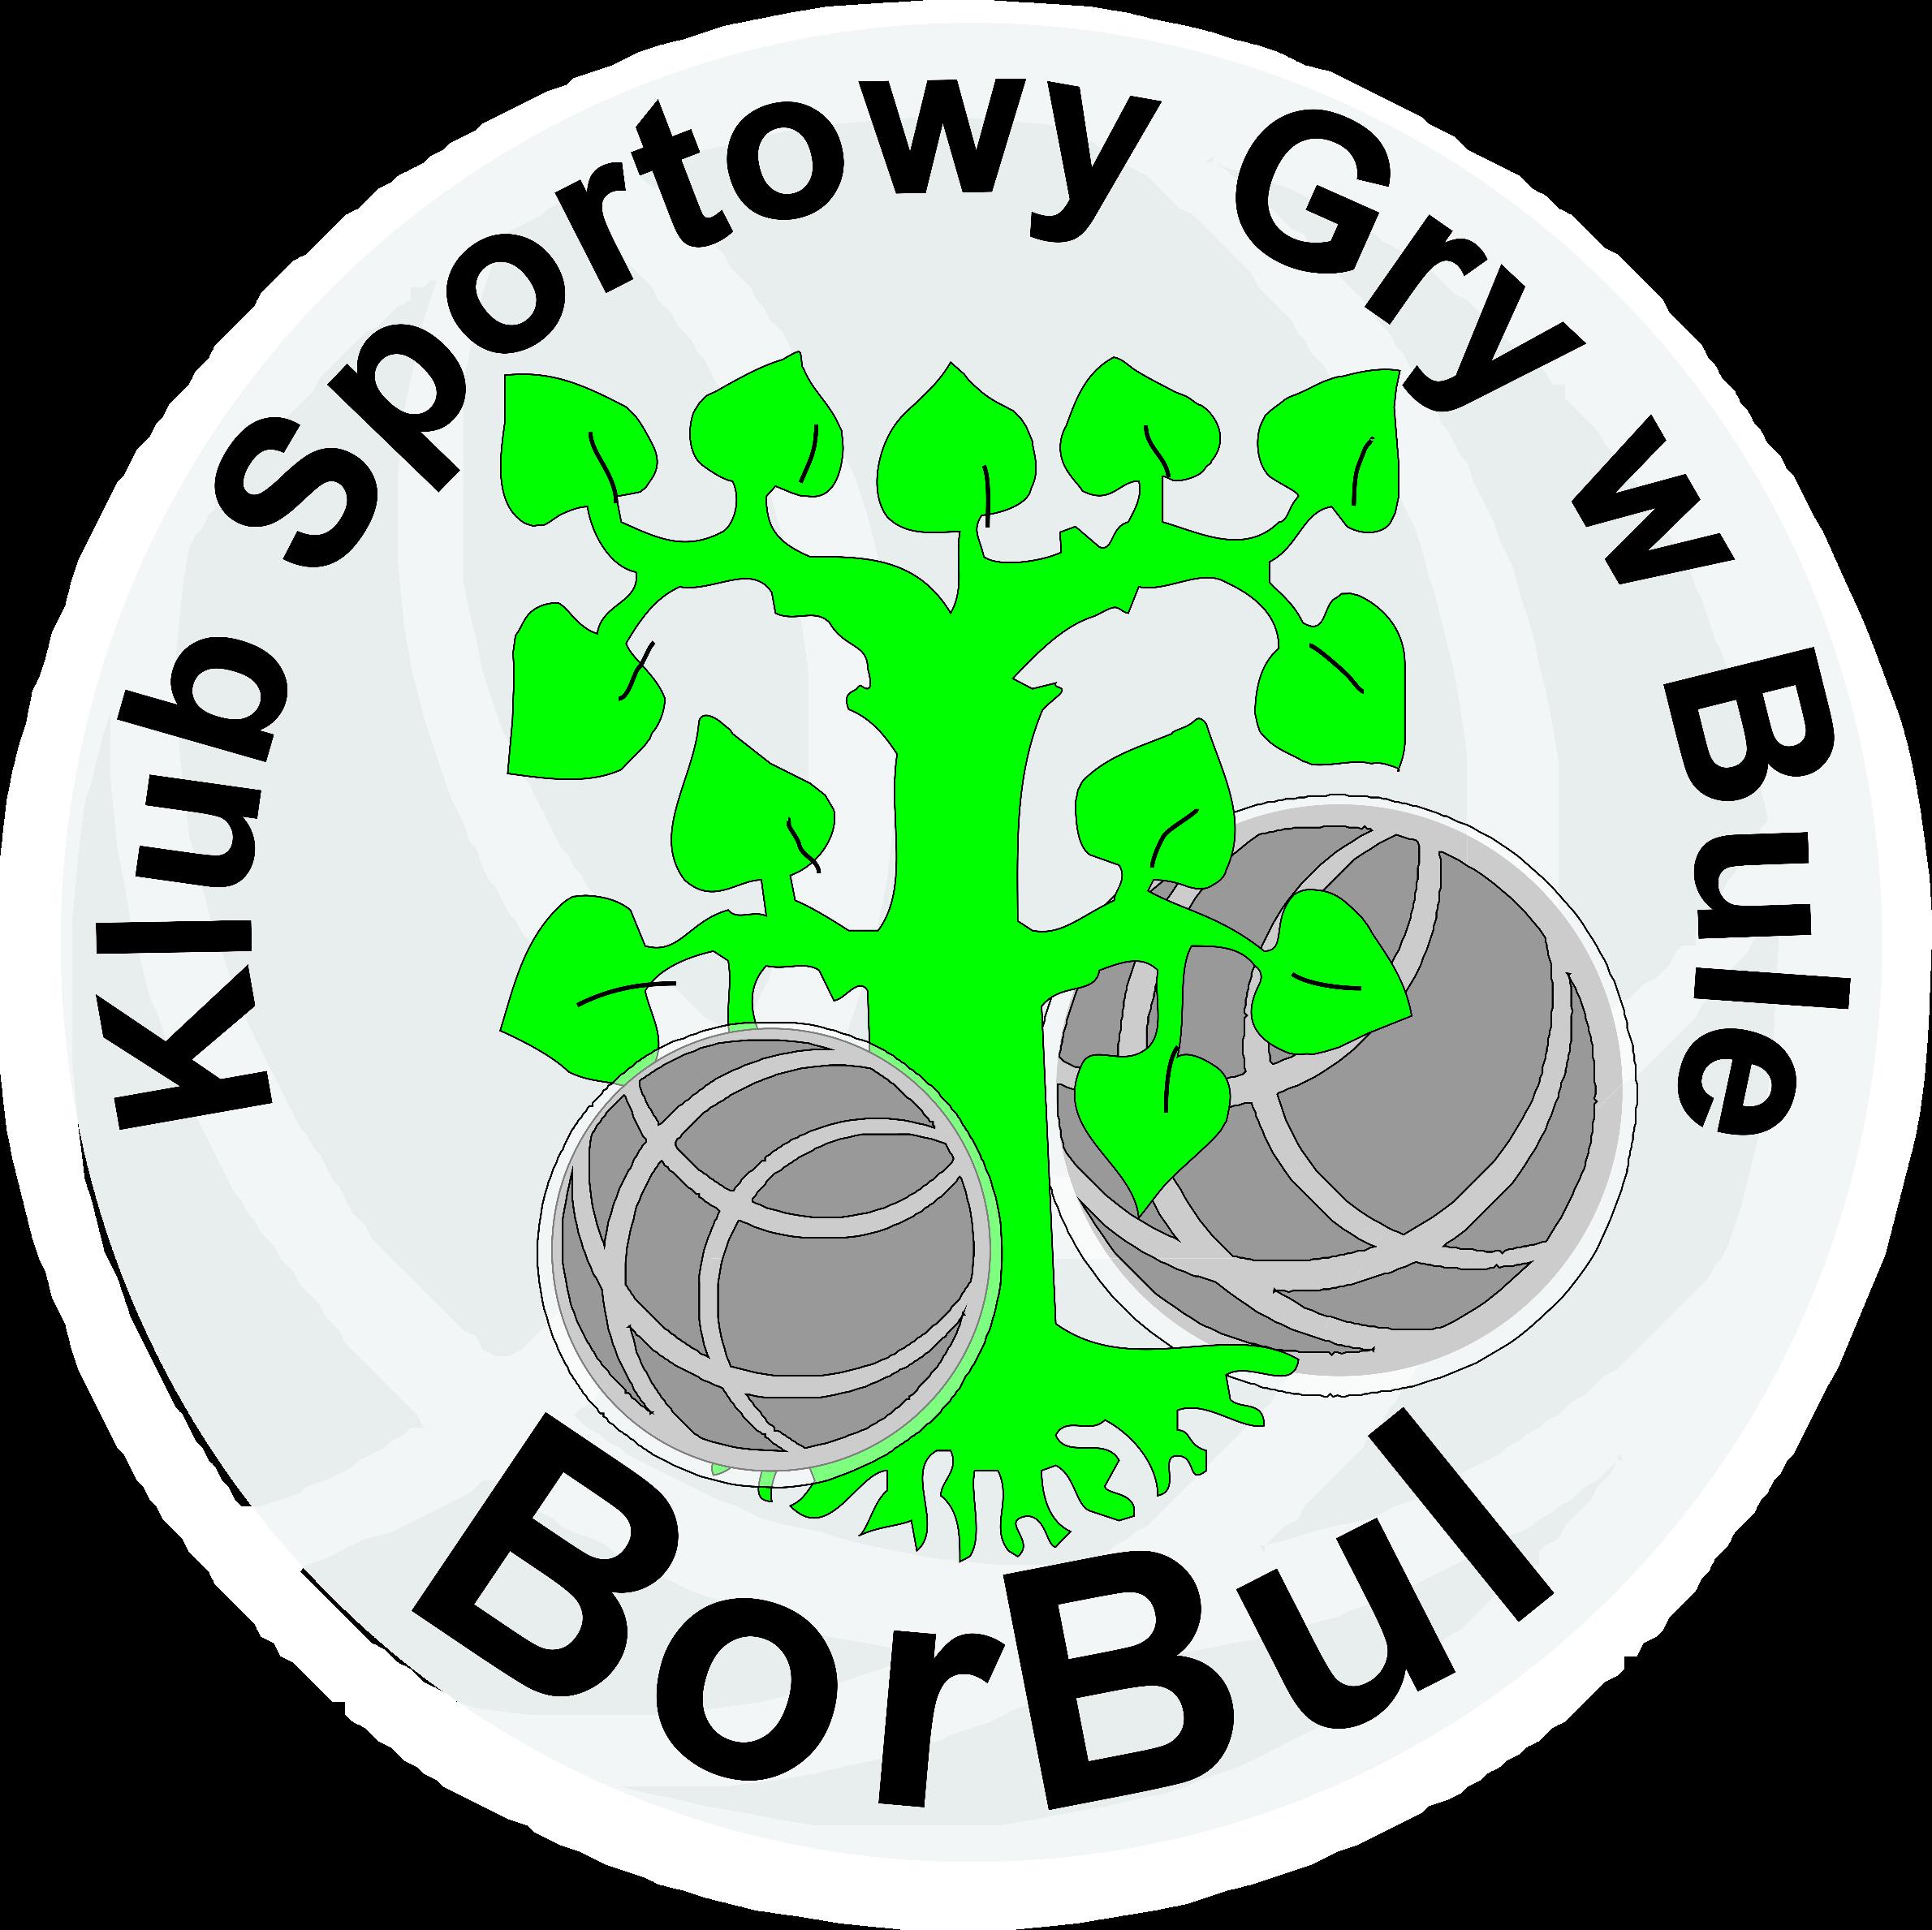 Klub Sportowy BORBUL Borne Sulinowo